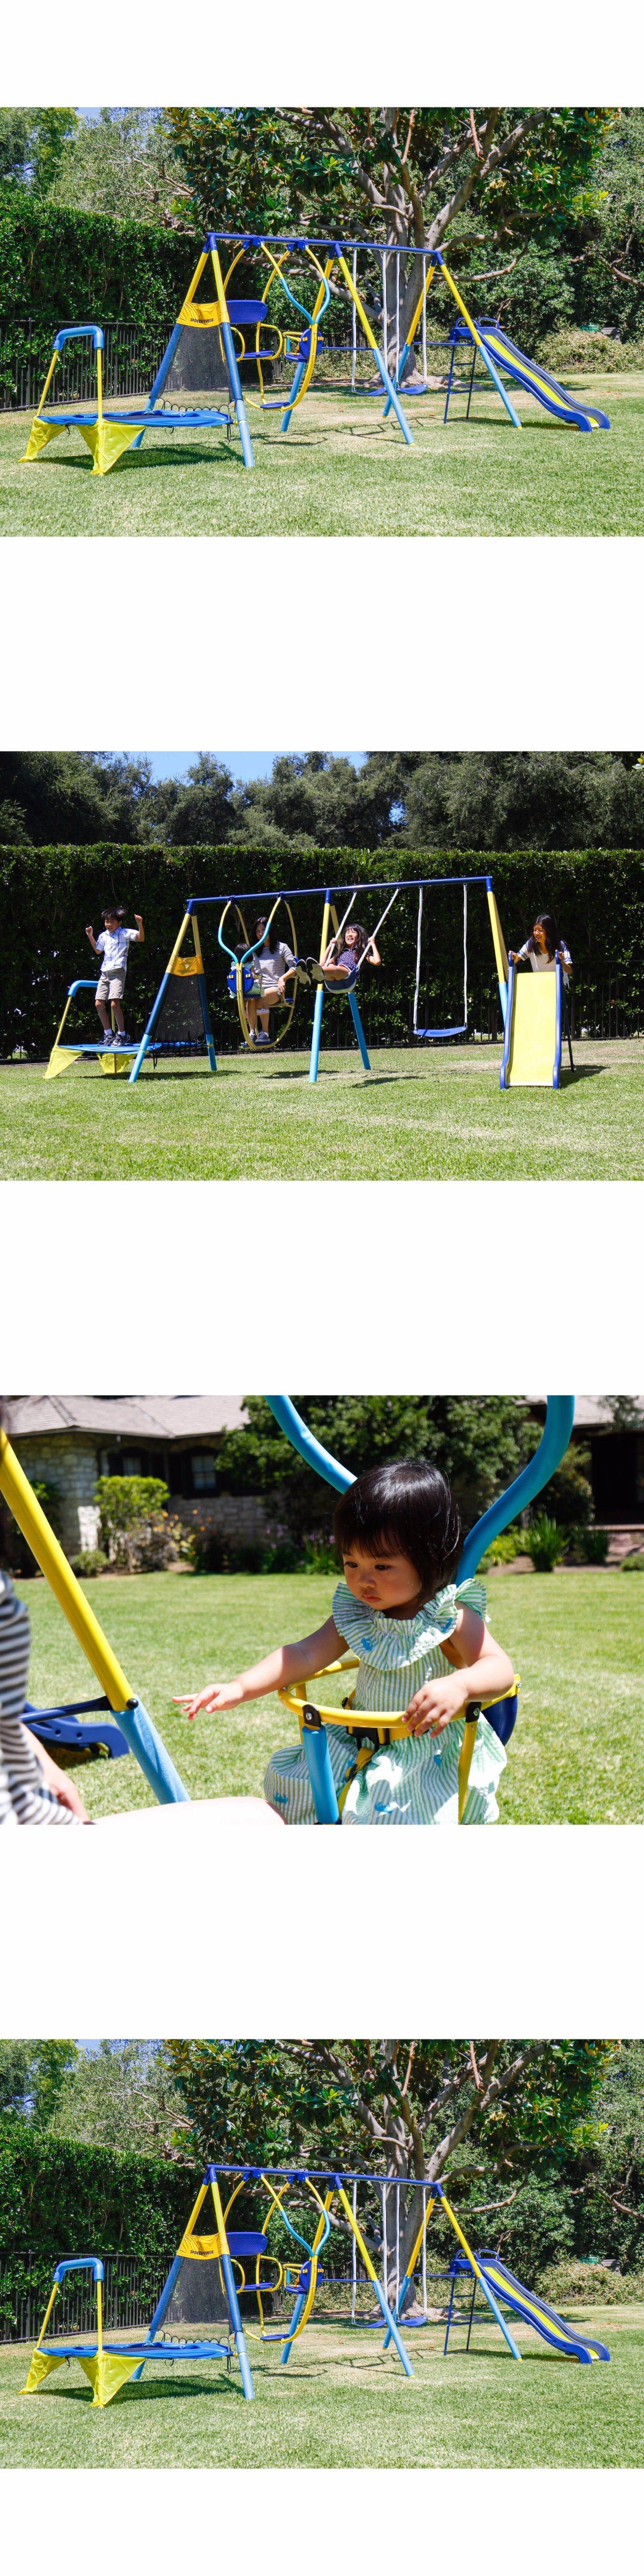 swings slides and gyms 16515 metal swing set playground swingset